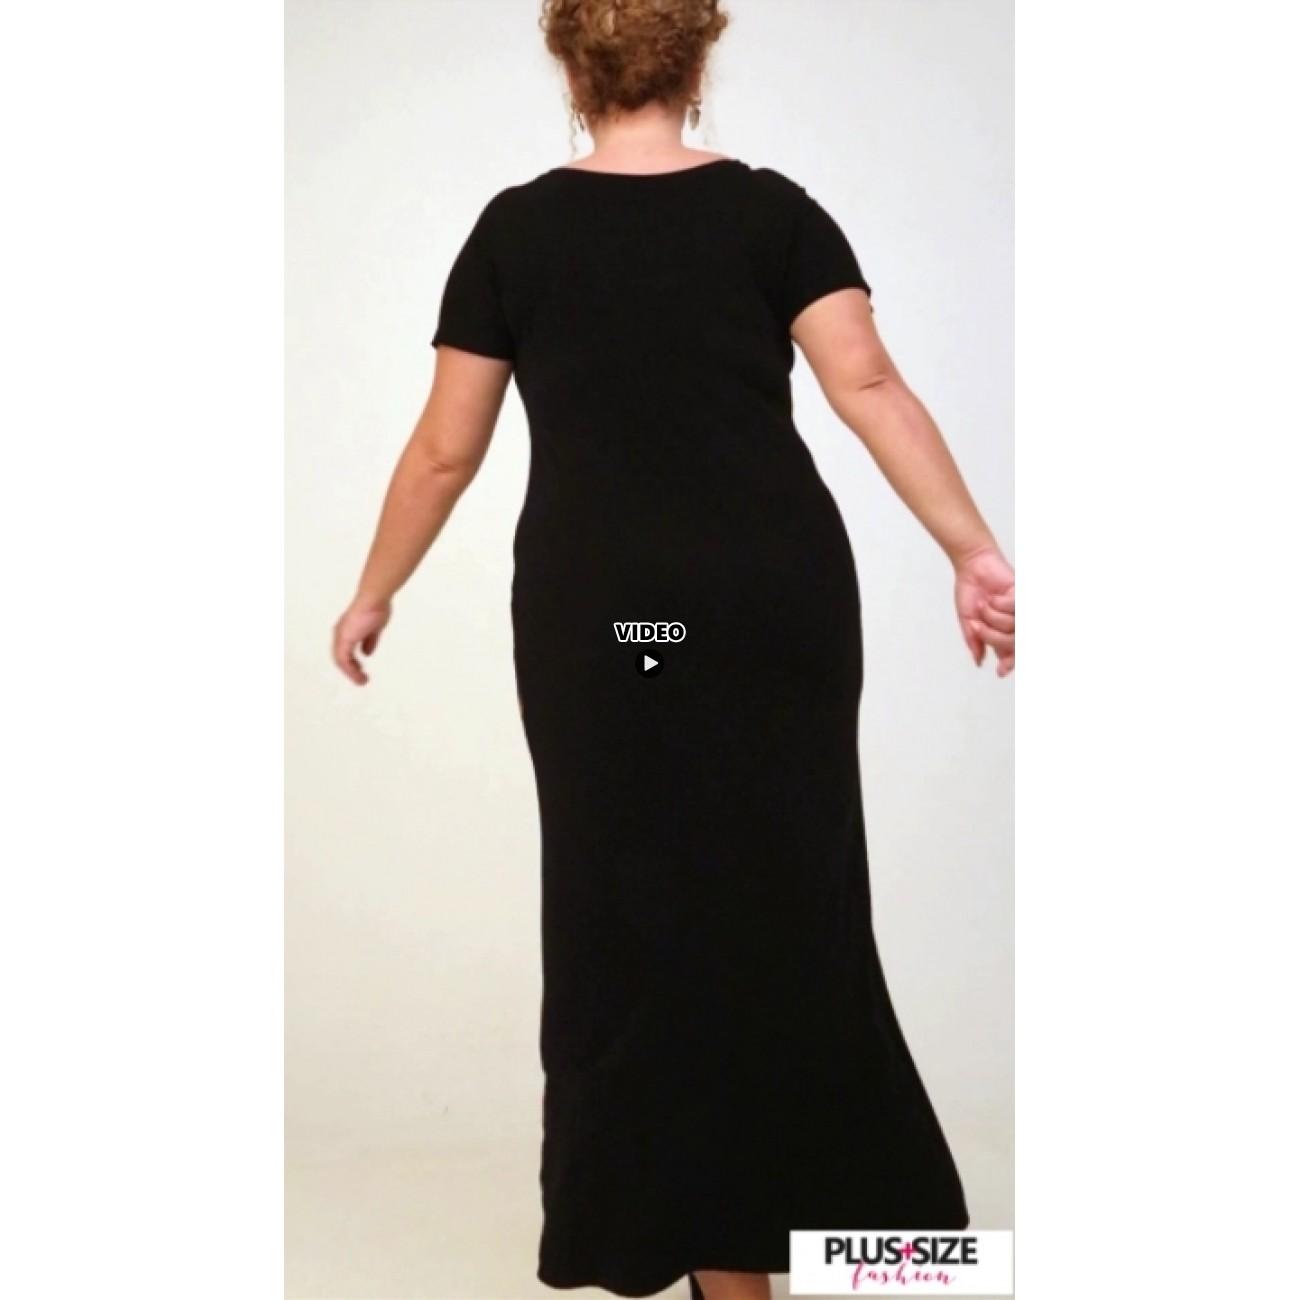 A21-7723FK Long Jersey Dress with pattern